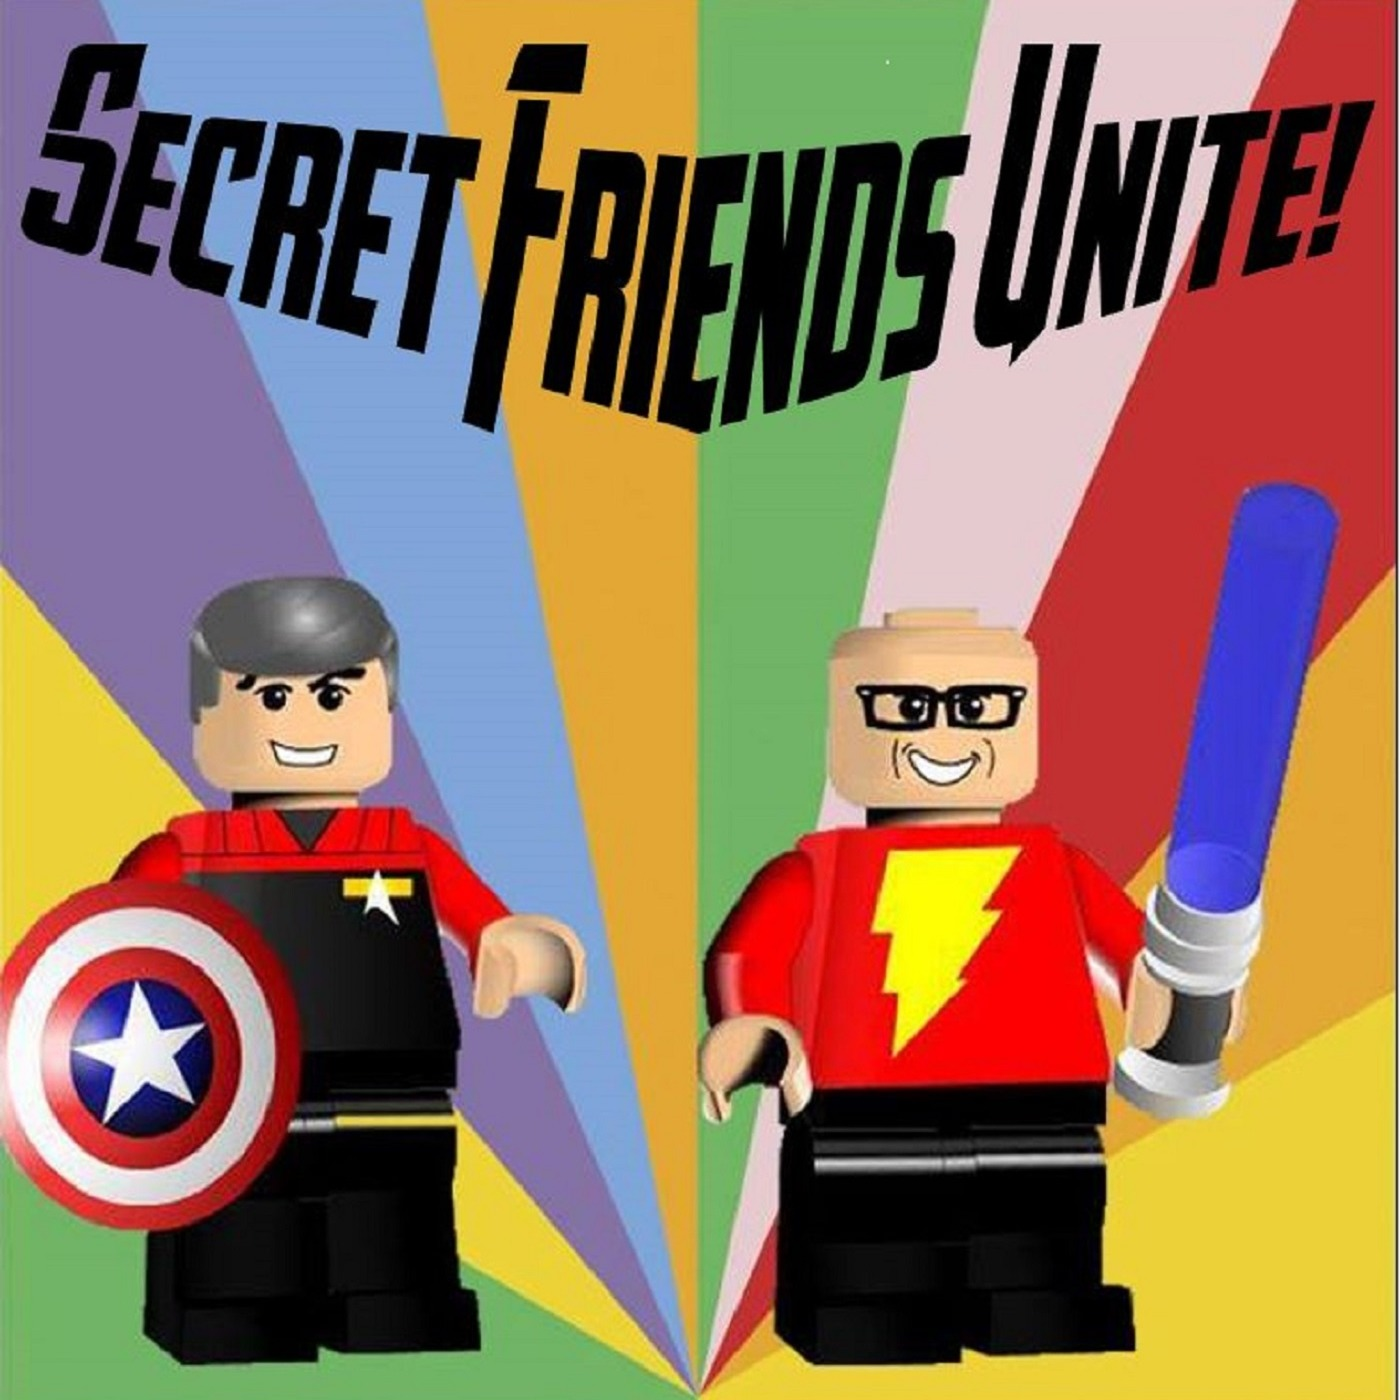 Secret Friends Unite! podcast